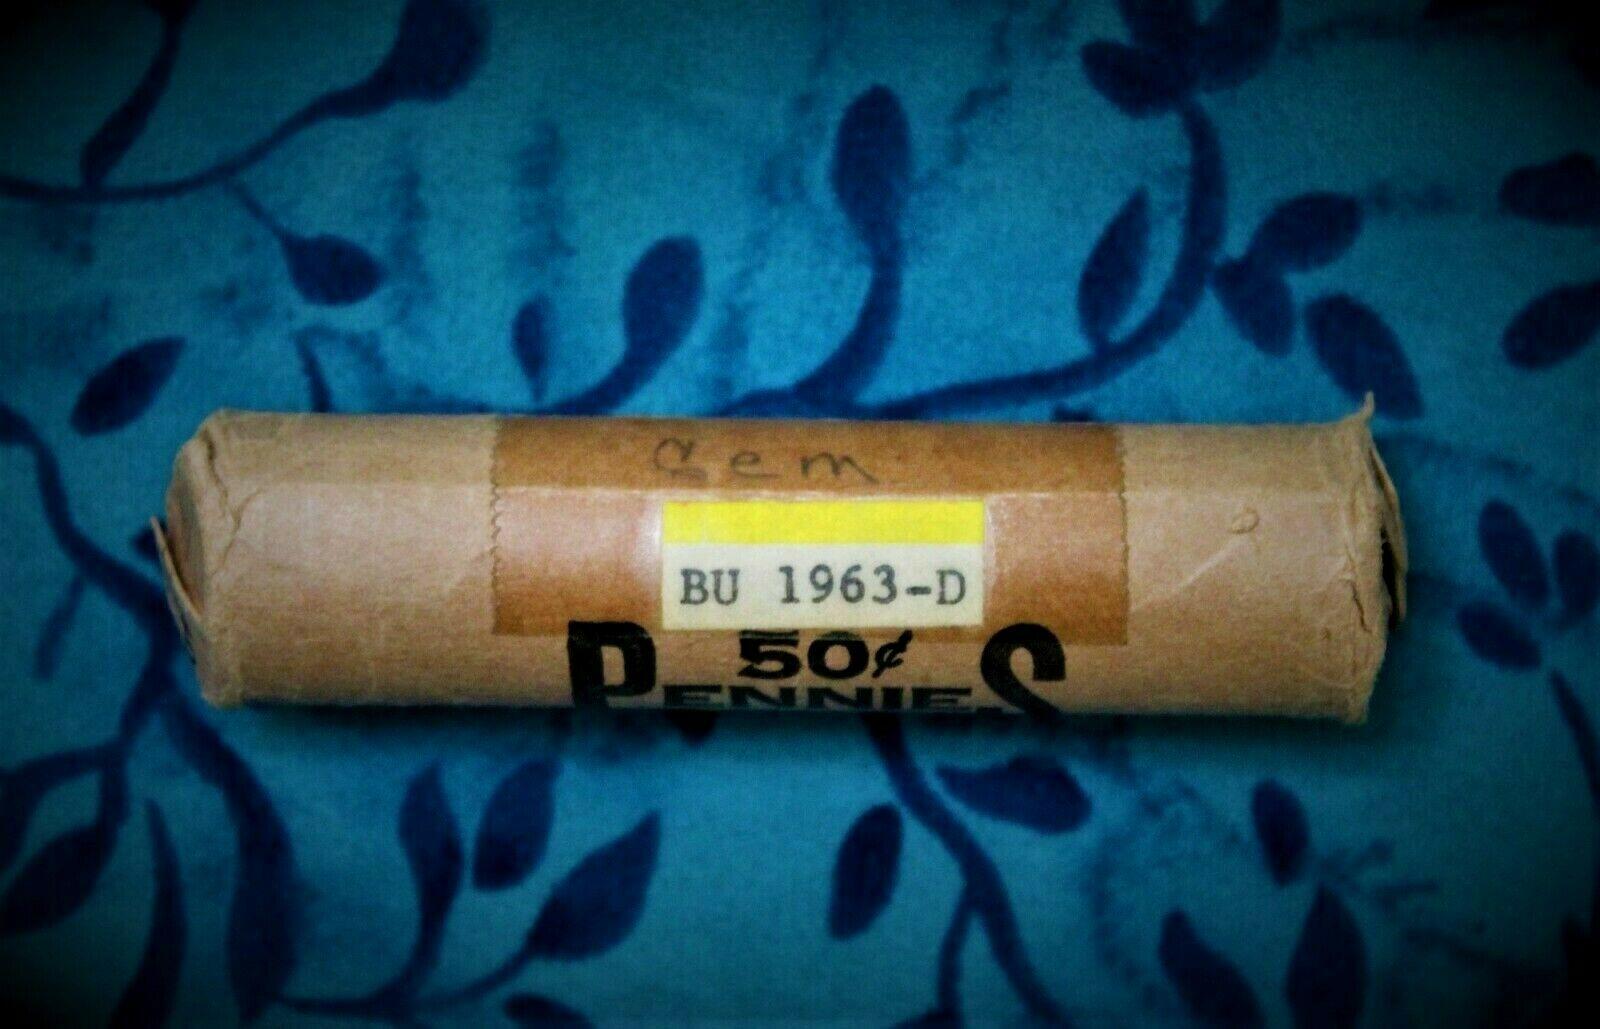 1963-D BU Lincoln Penny Roll--estate sale--MIS75 - Image 1